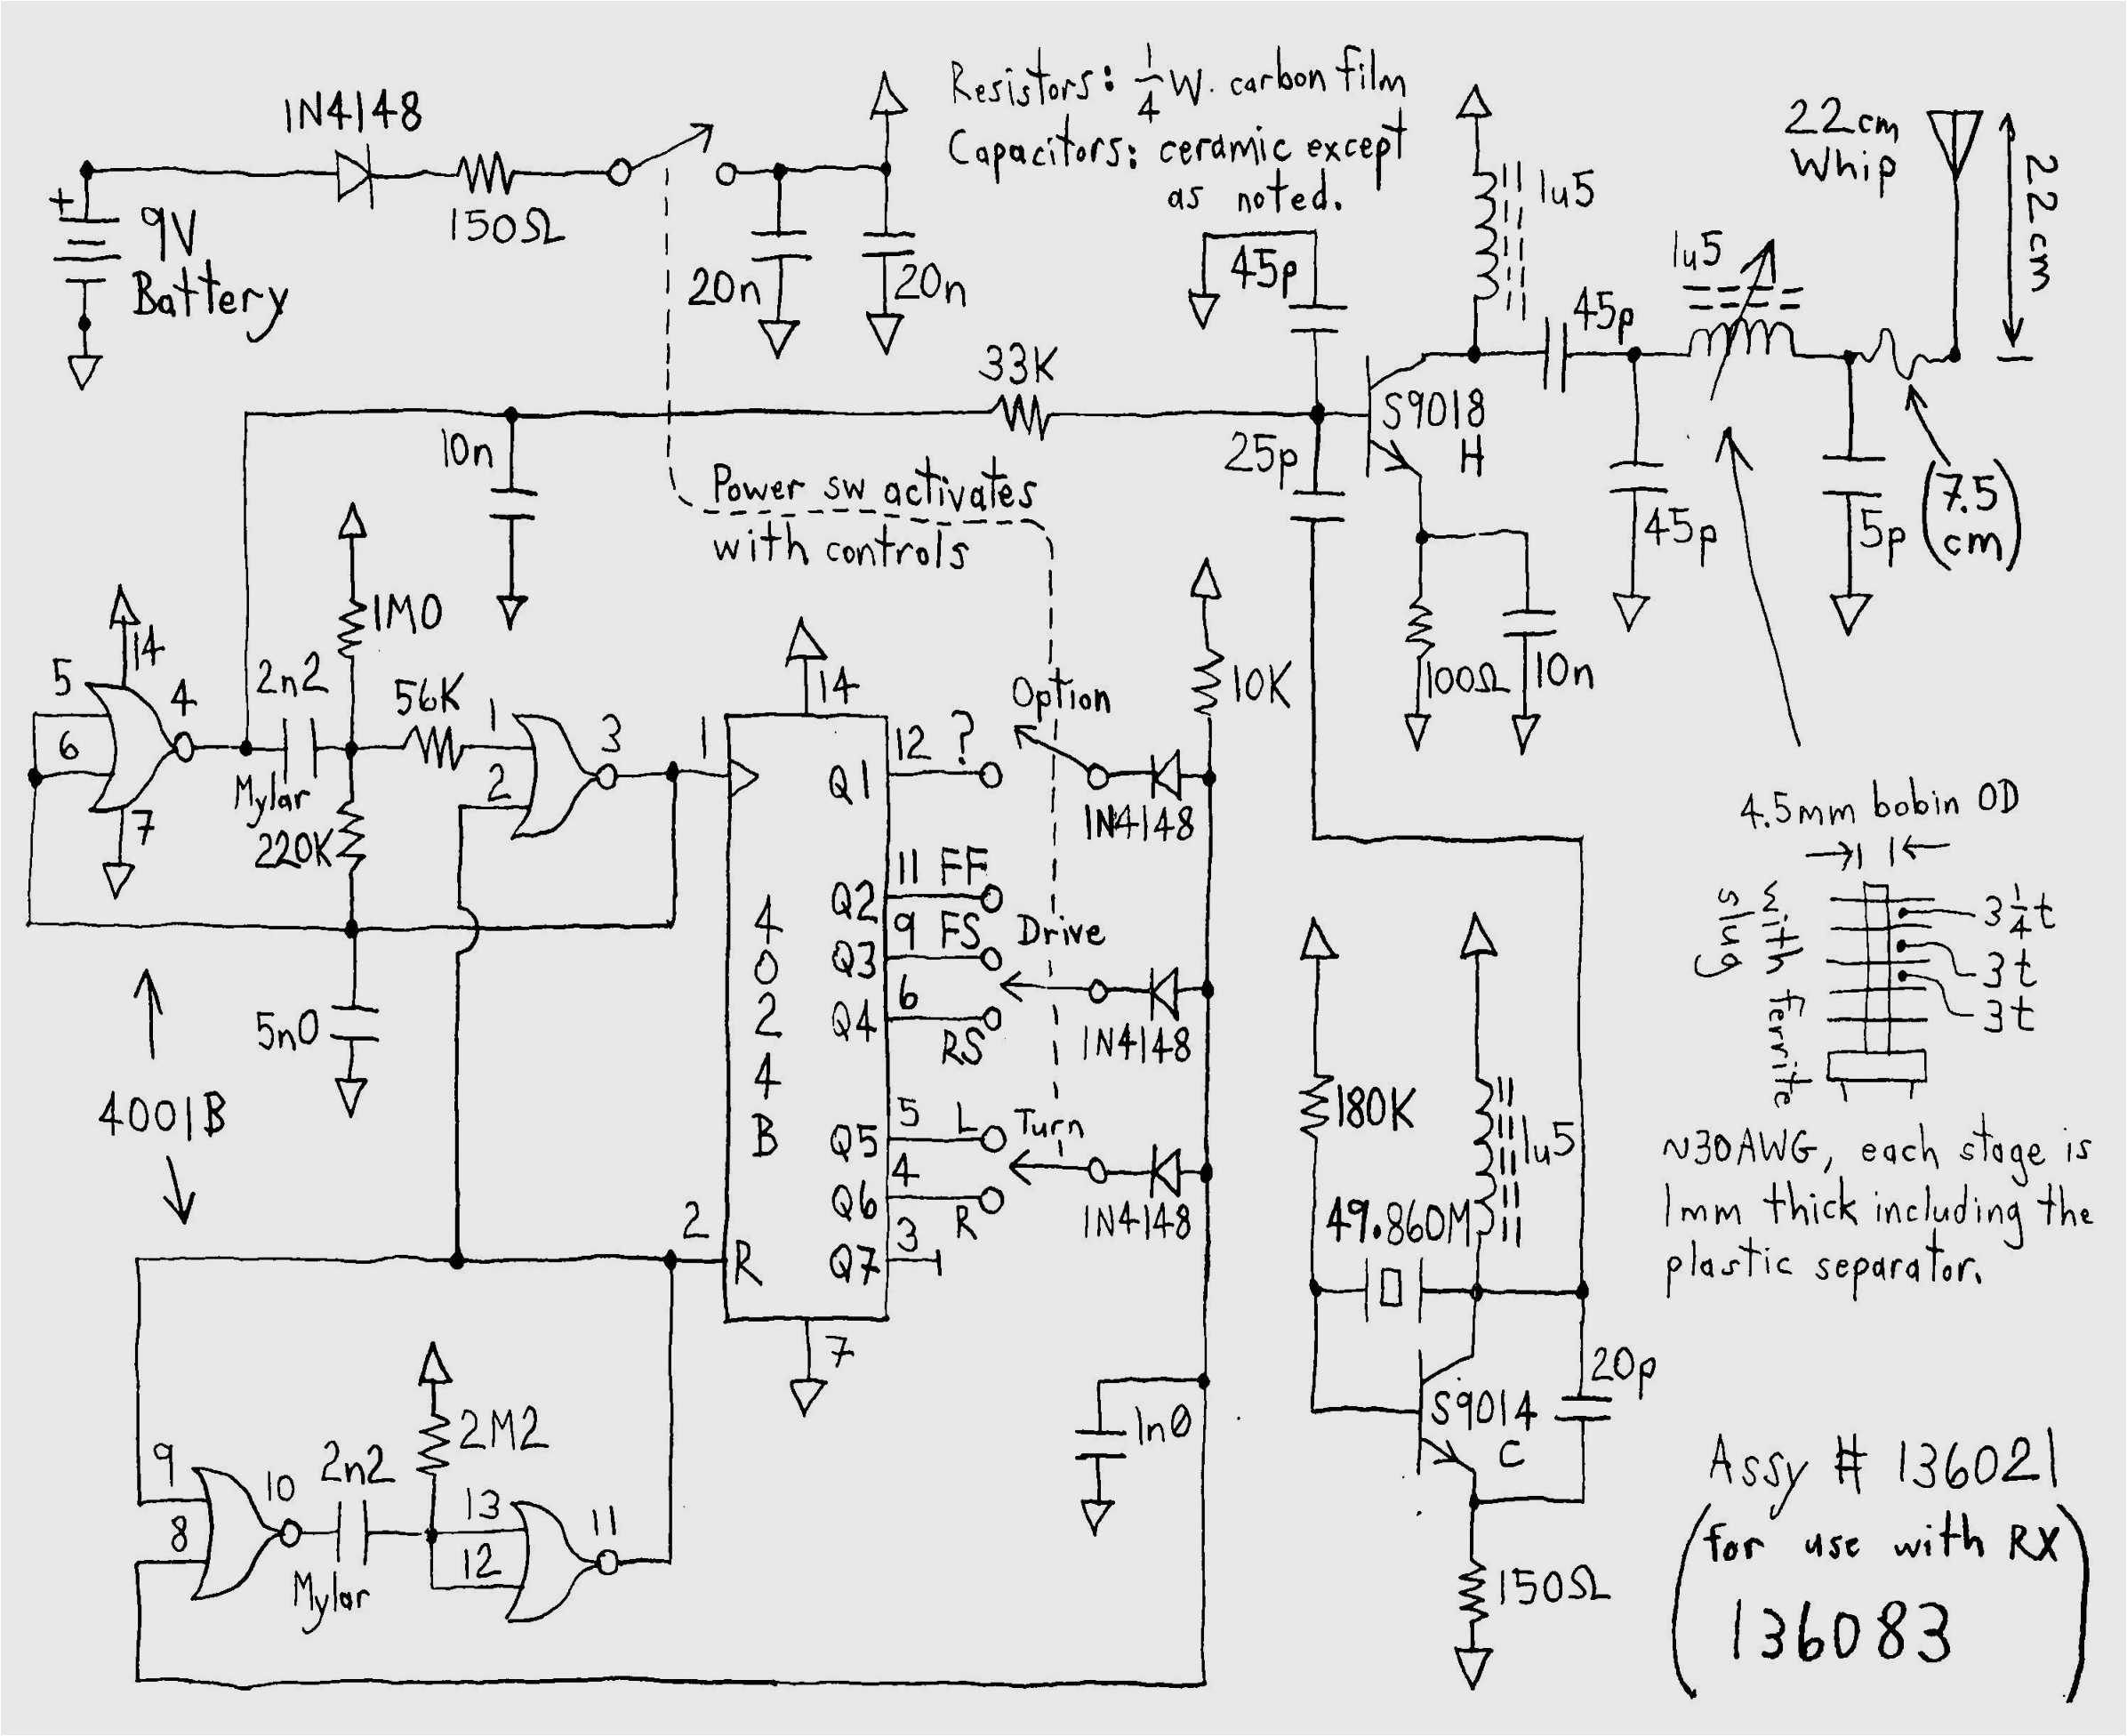 2005 gmc radio wiring diagram radio wiring diagram for 2007 jeep